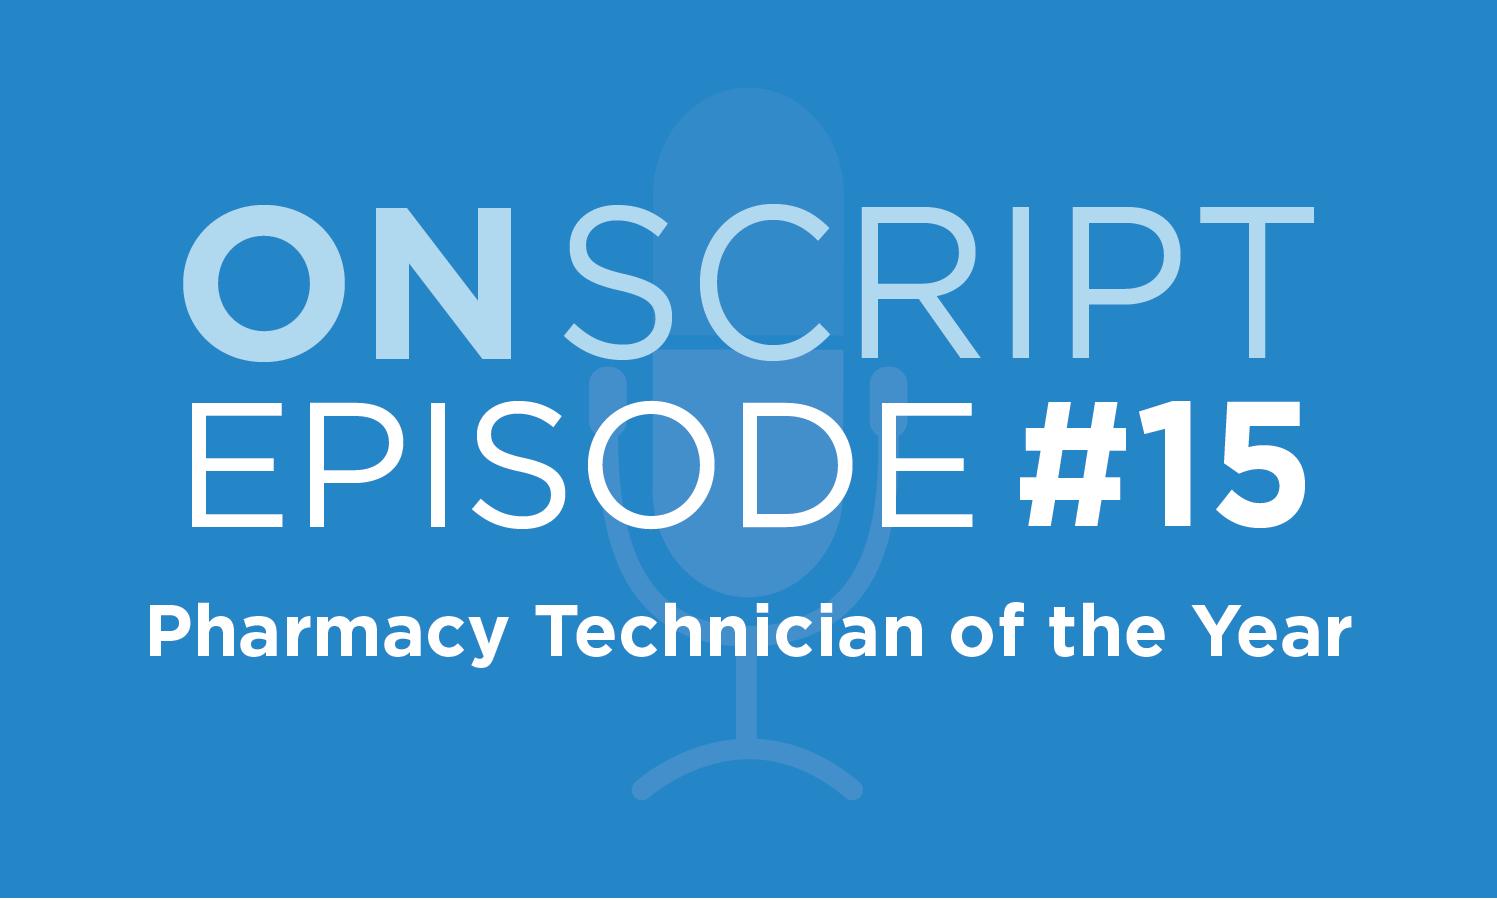 OnScript episode #15